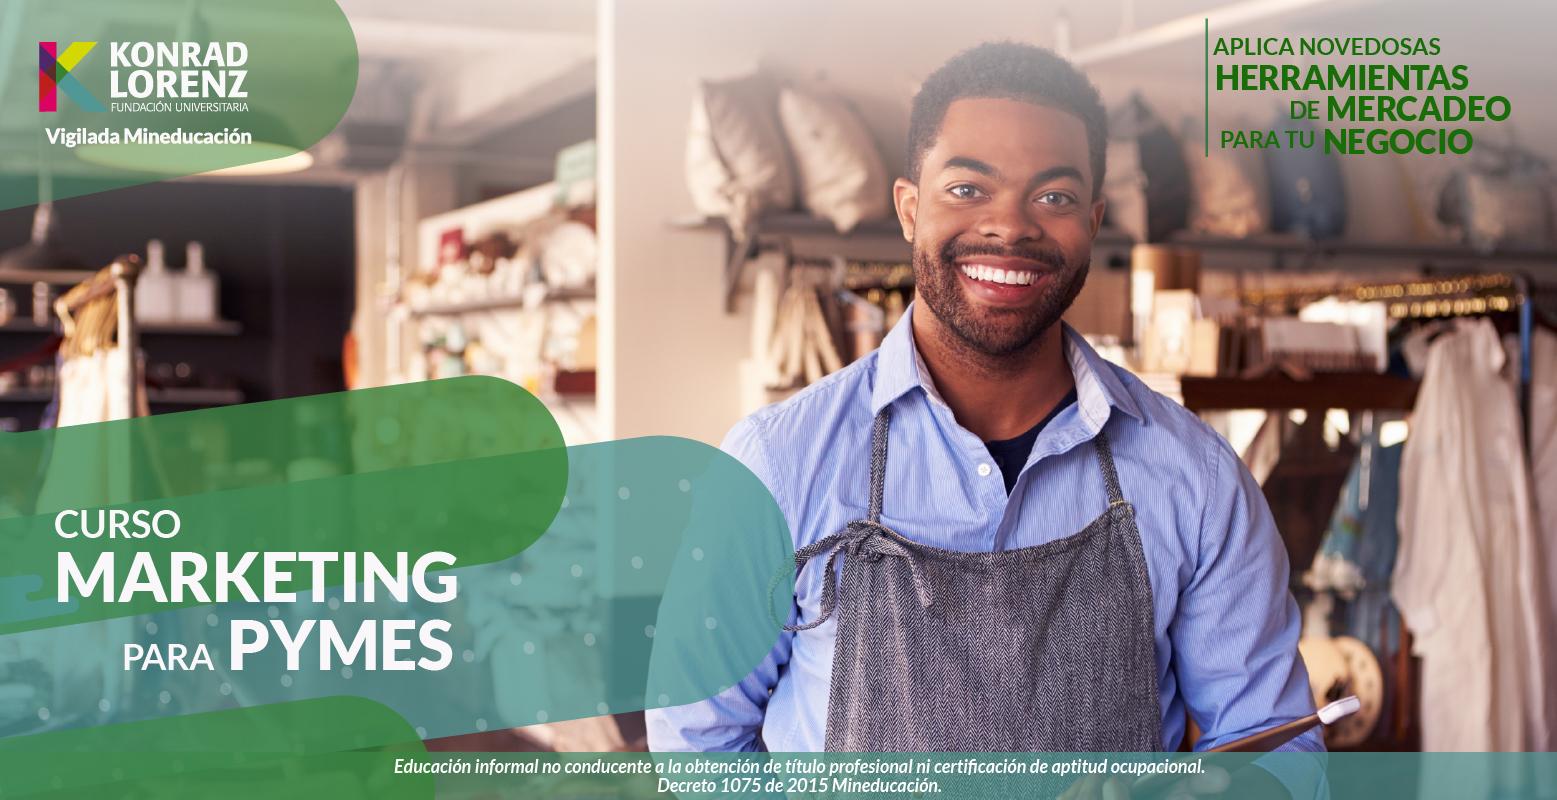 Curso de Marketing para PYMES